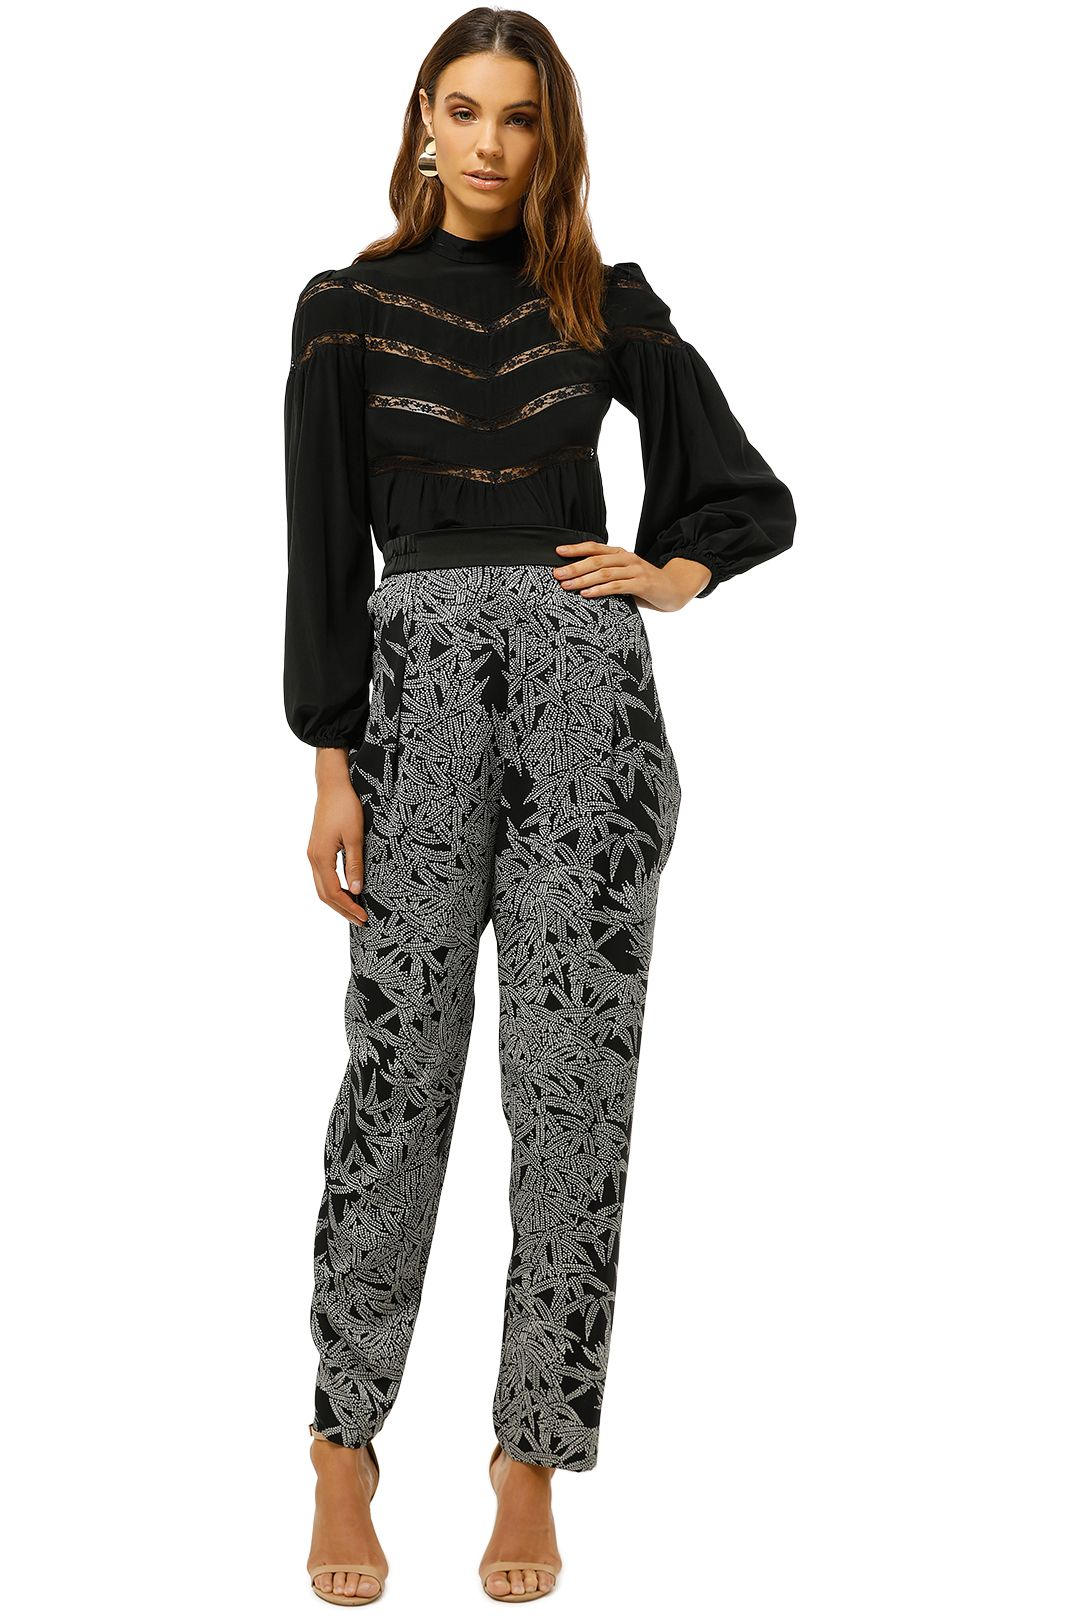 Diane-Von-Furstenberg-Printed-Silk-Blend-Crepe-Tapered-Pants-Black-Print-Front